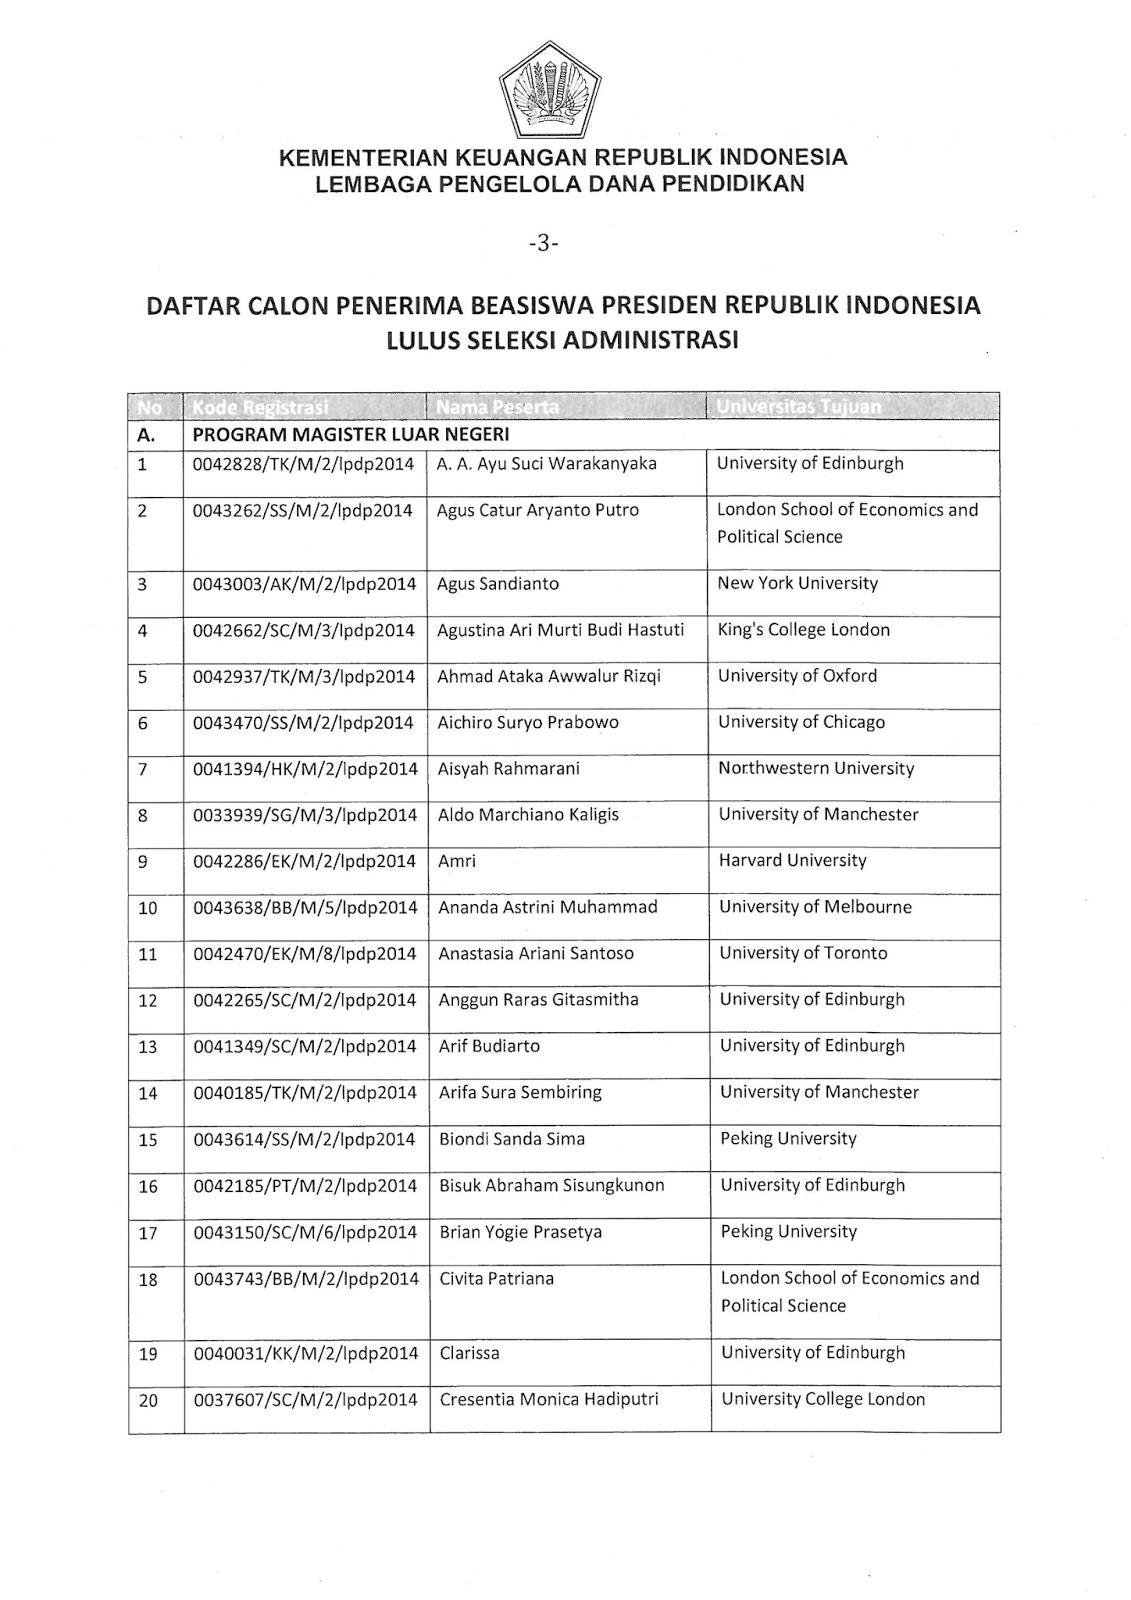 Surat Kemenkue Yang Lulus Seleksi Beasiswa Presiden RI  Ahmad Ataka Nomor Urut 5 (klik untuk memperbesar)